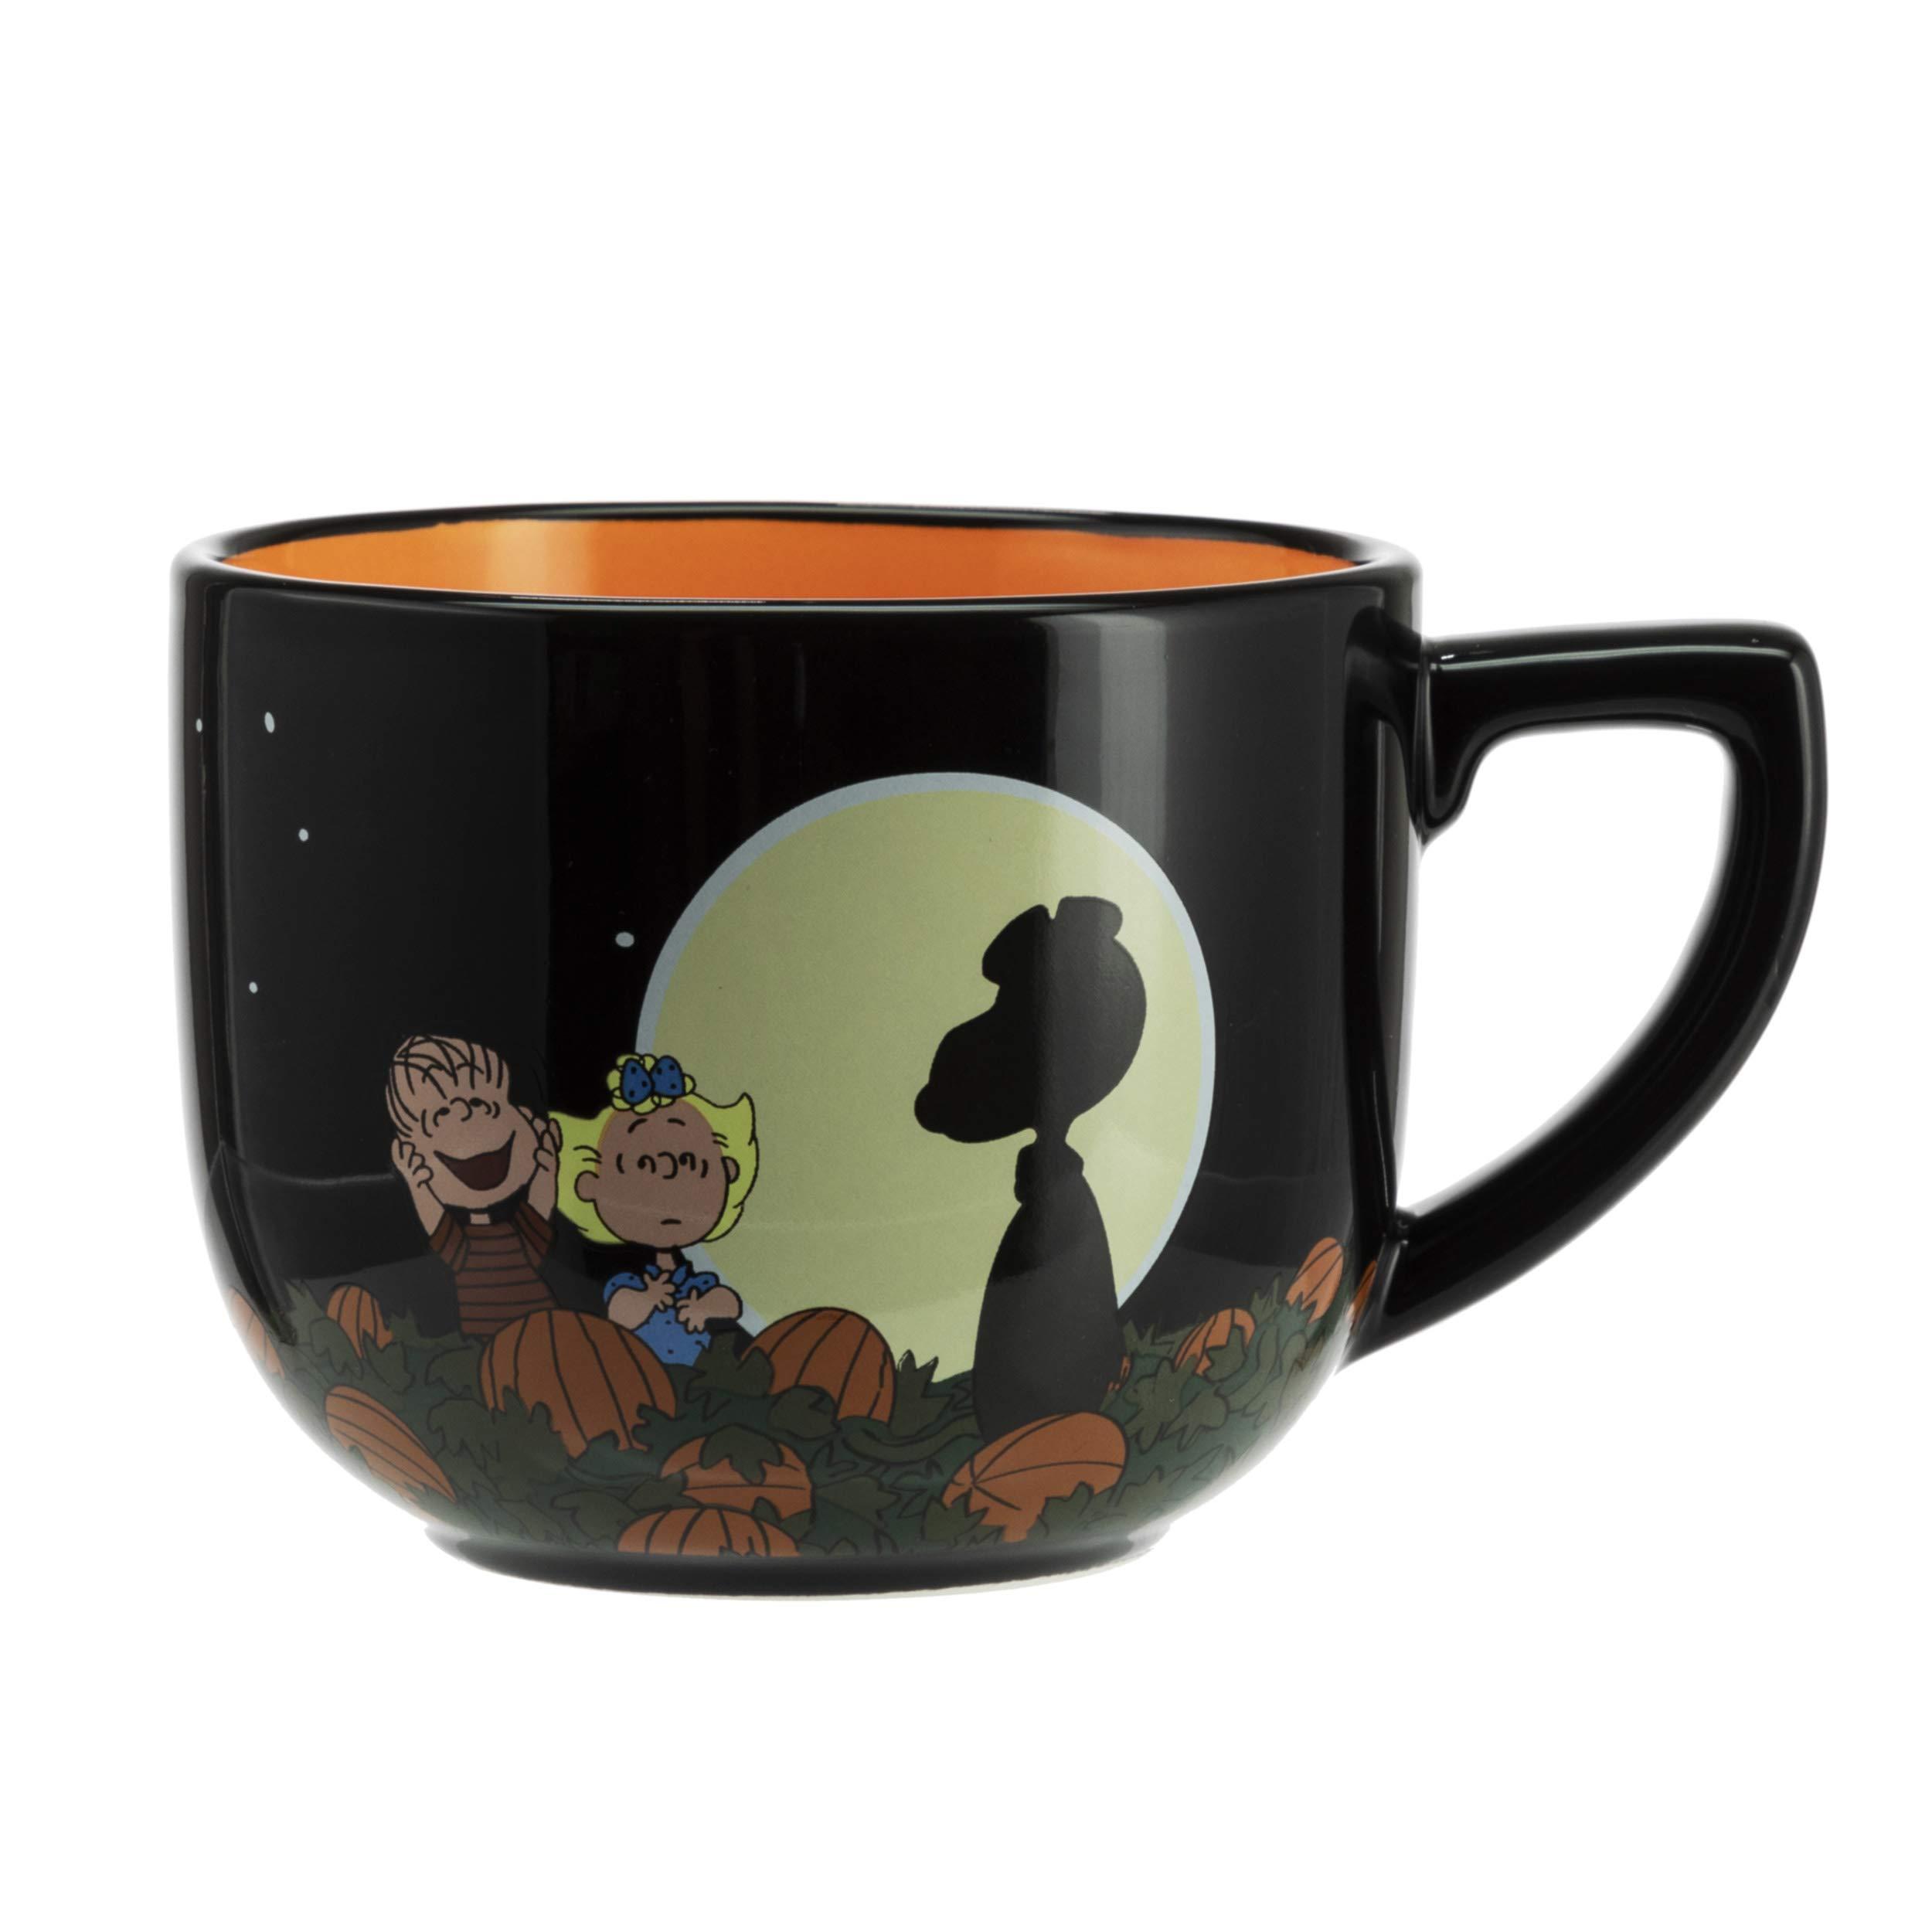 Hallmark 6MJN1510 Oversized Peanuts Mug, Large, Full Moon Snoopy by Hallmark